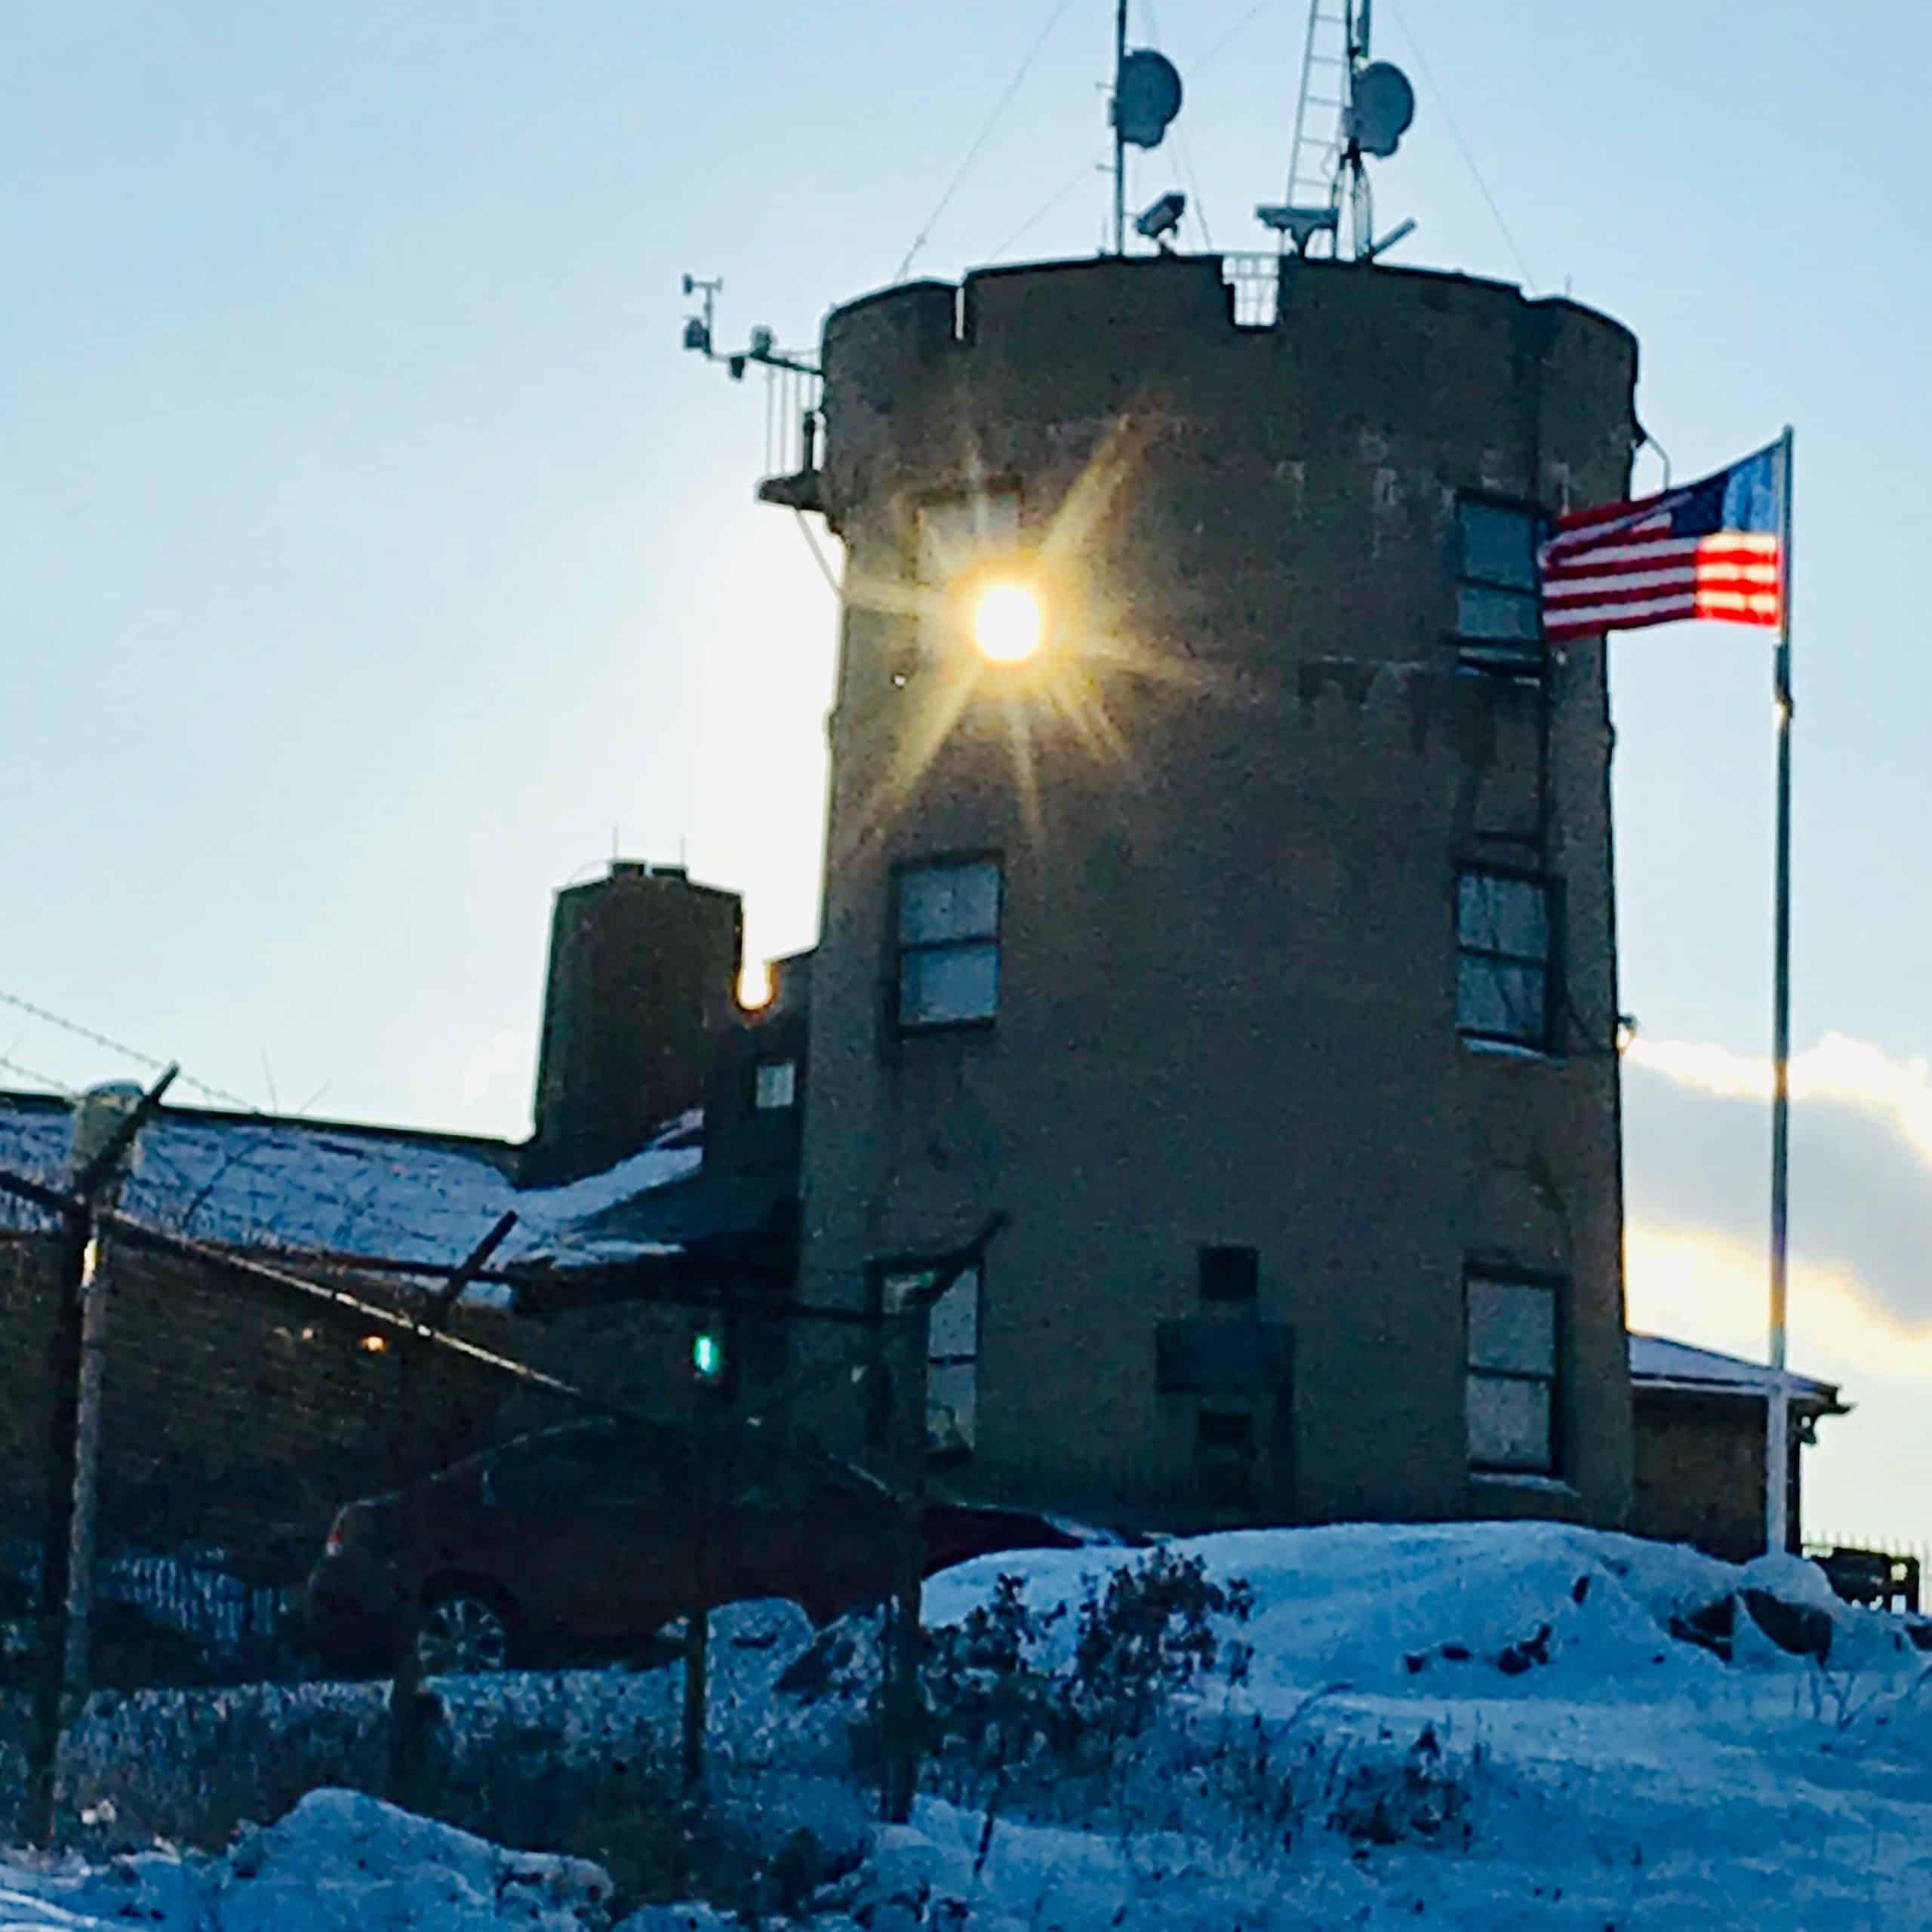 blue hill meteorological observatory at sunset